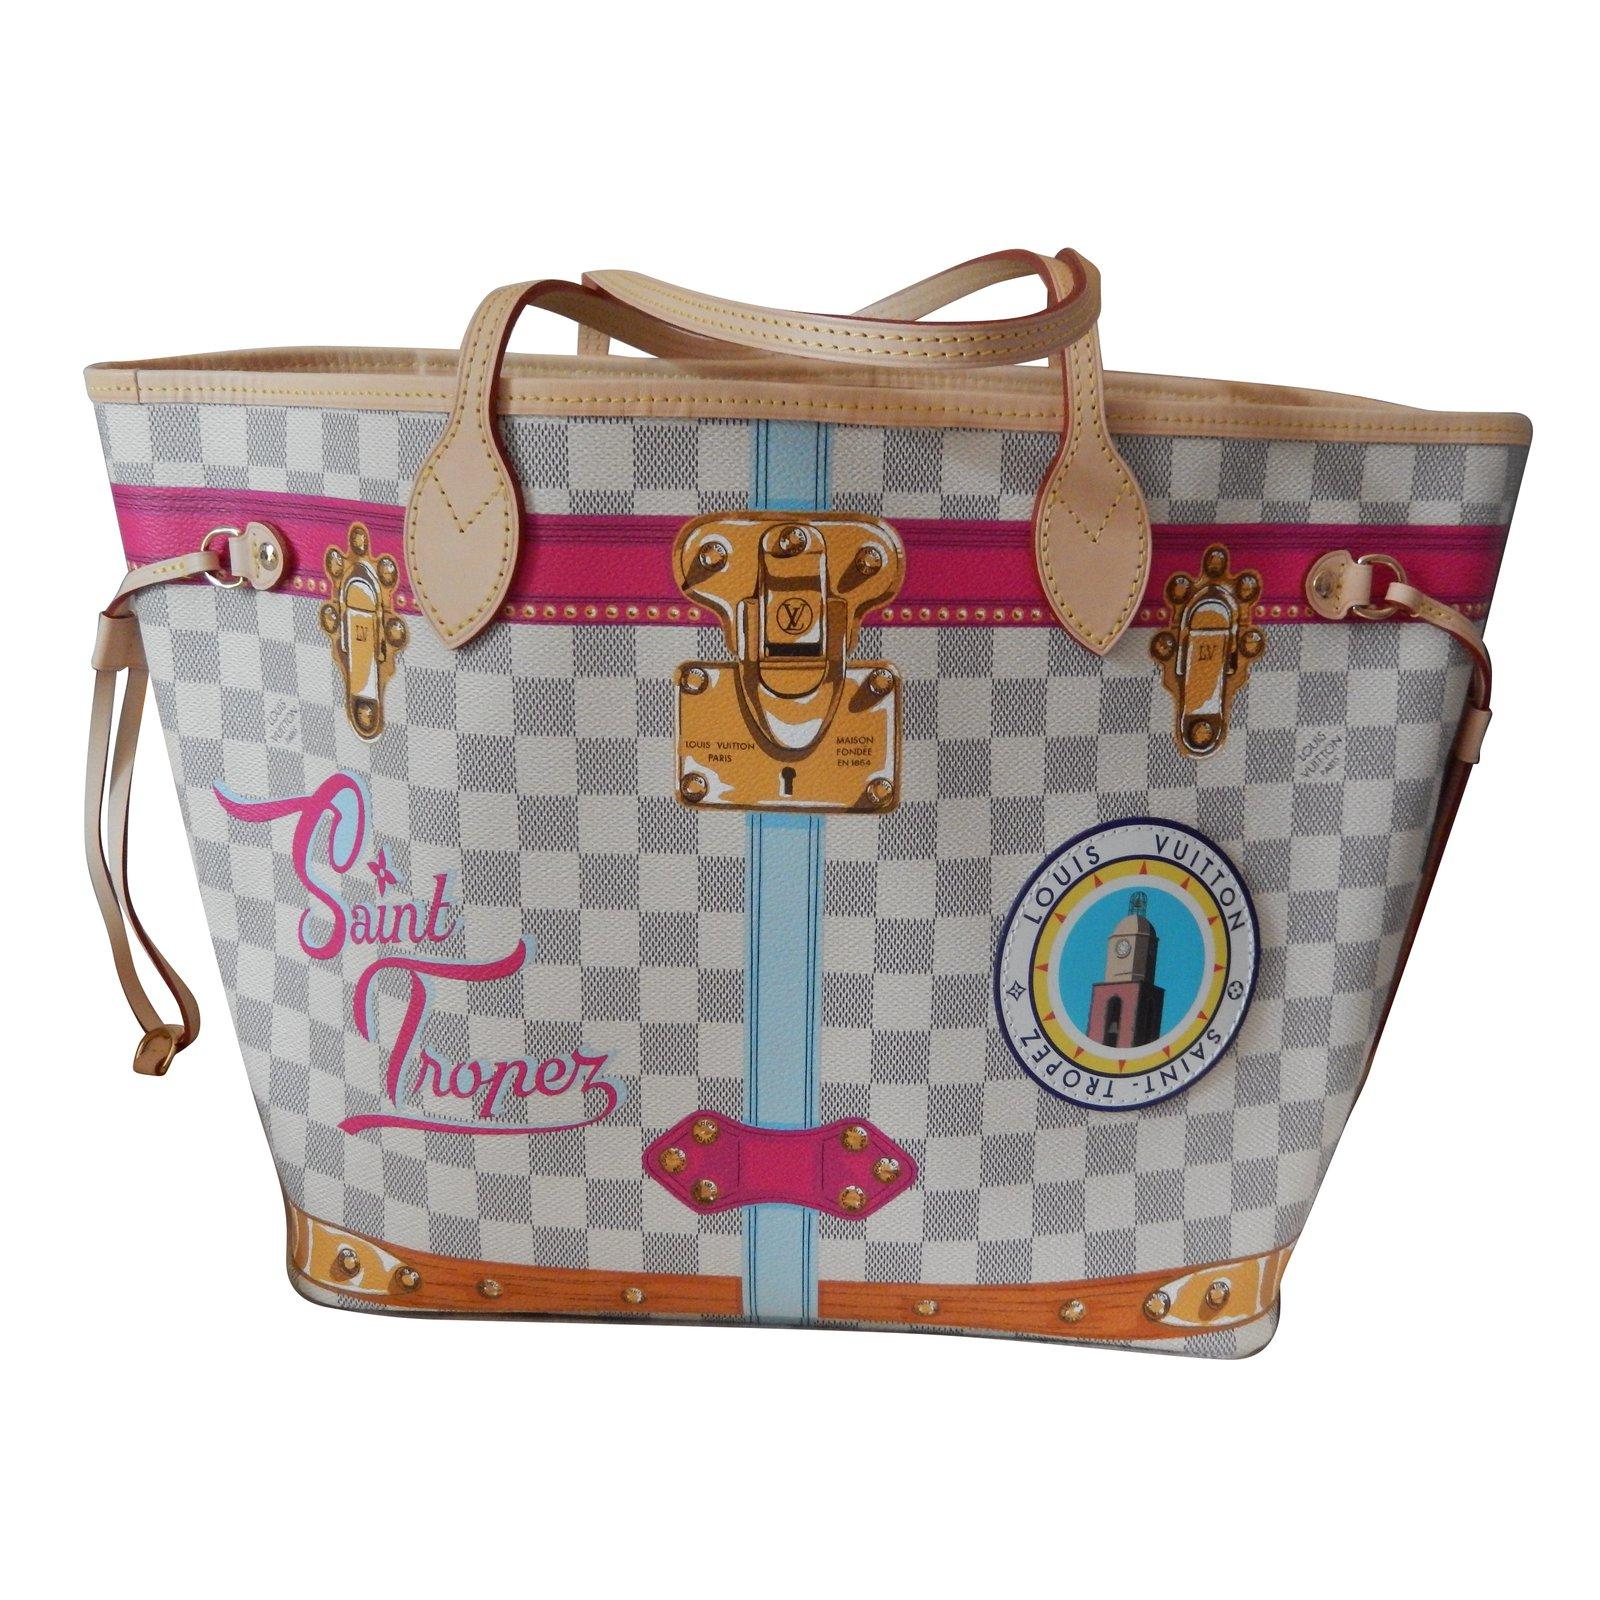 Louis Vuitton Maison Fondee En 1854 Handbag – Ventana Blog fc0ac3b4d650e